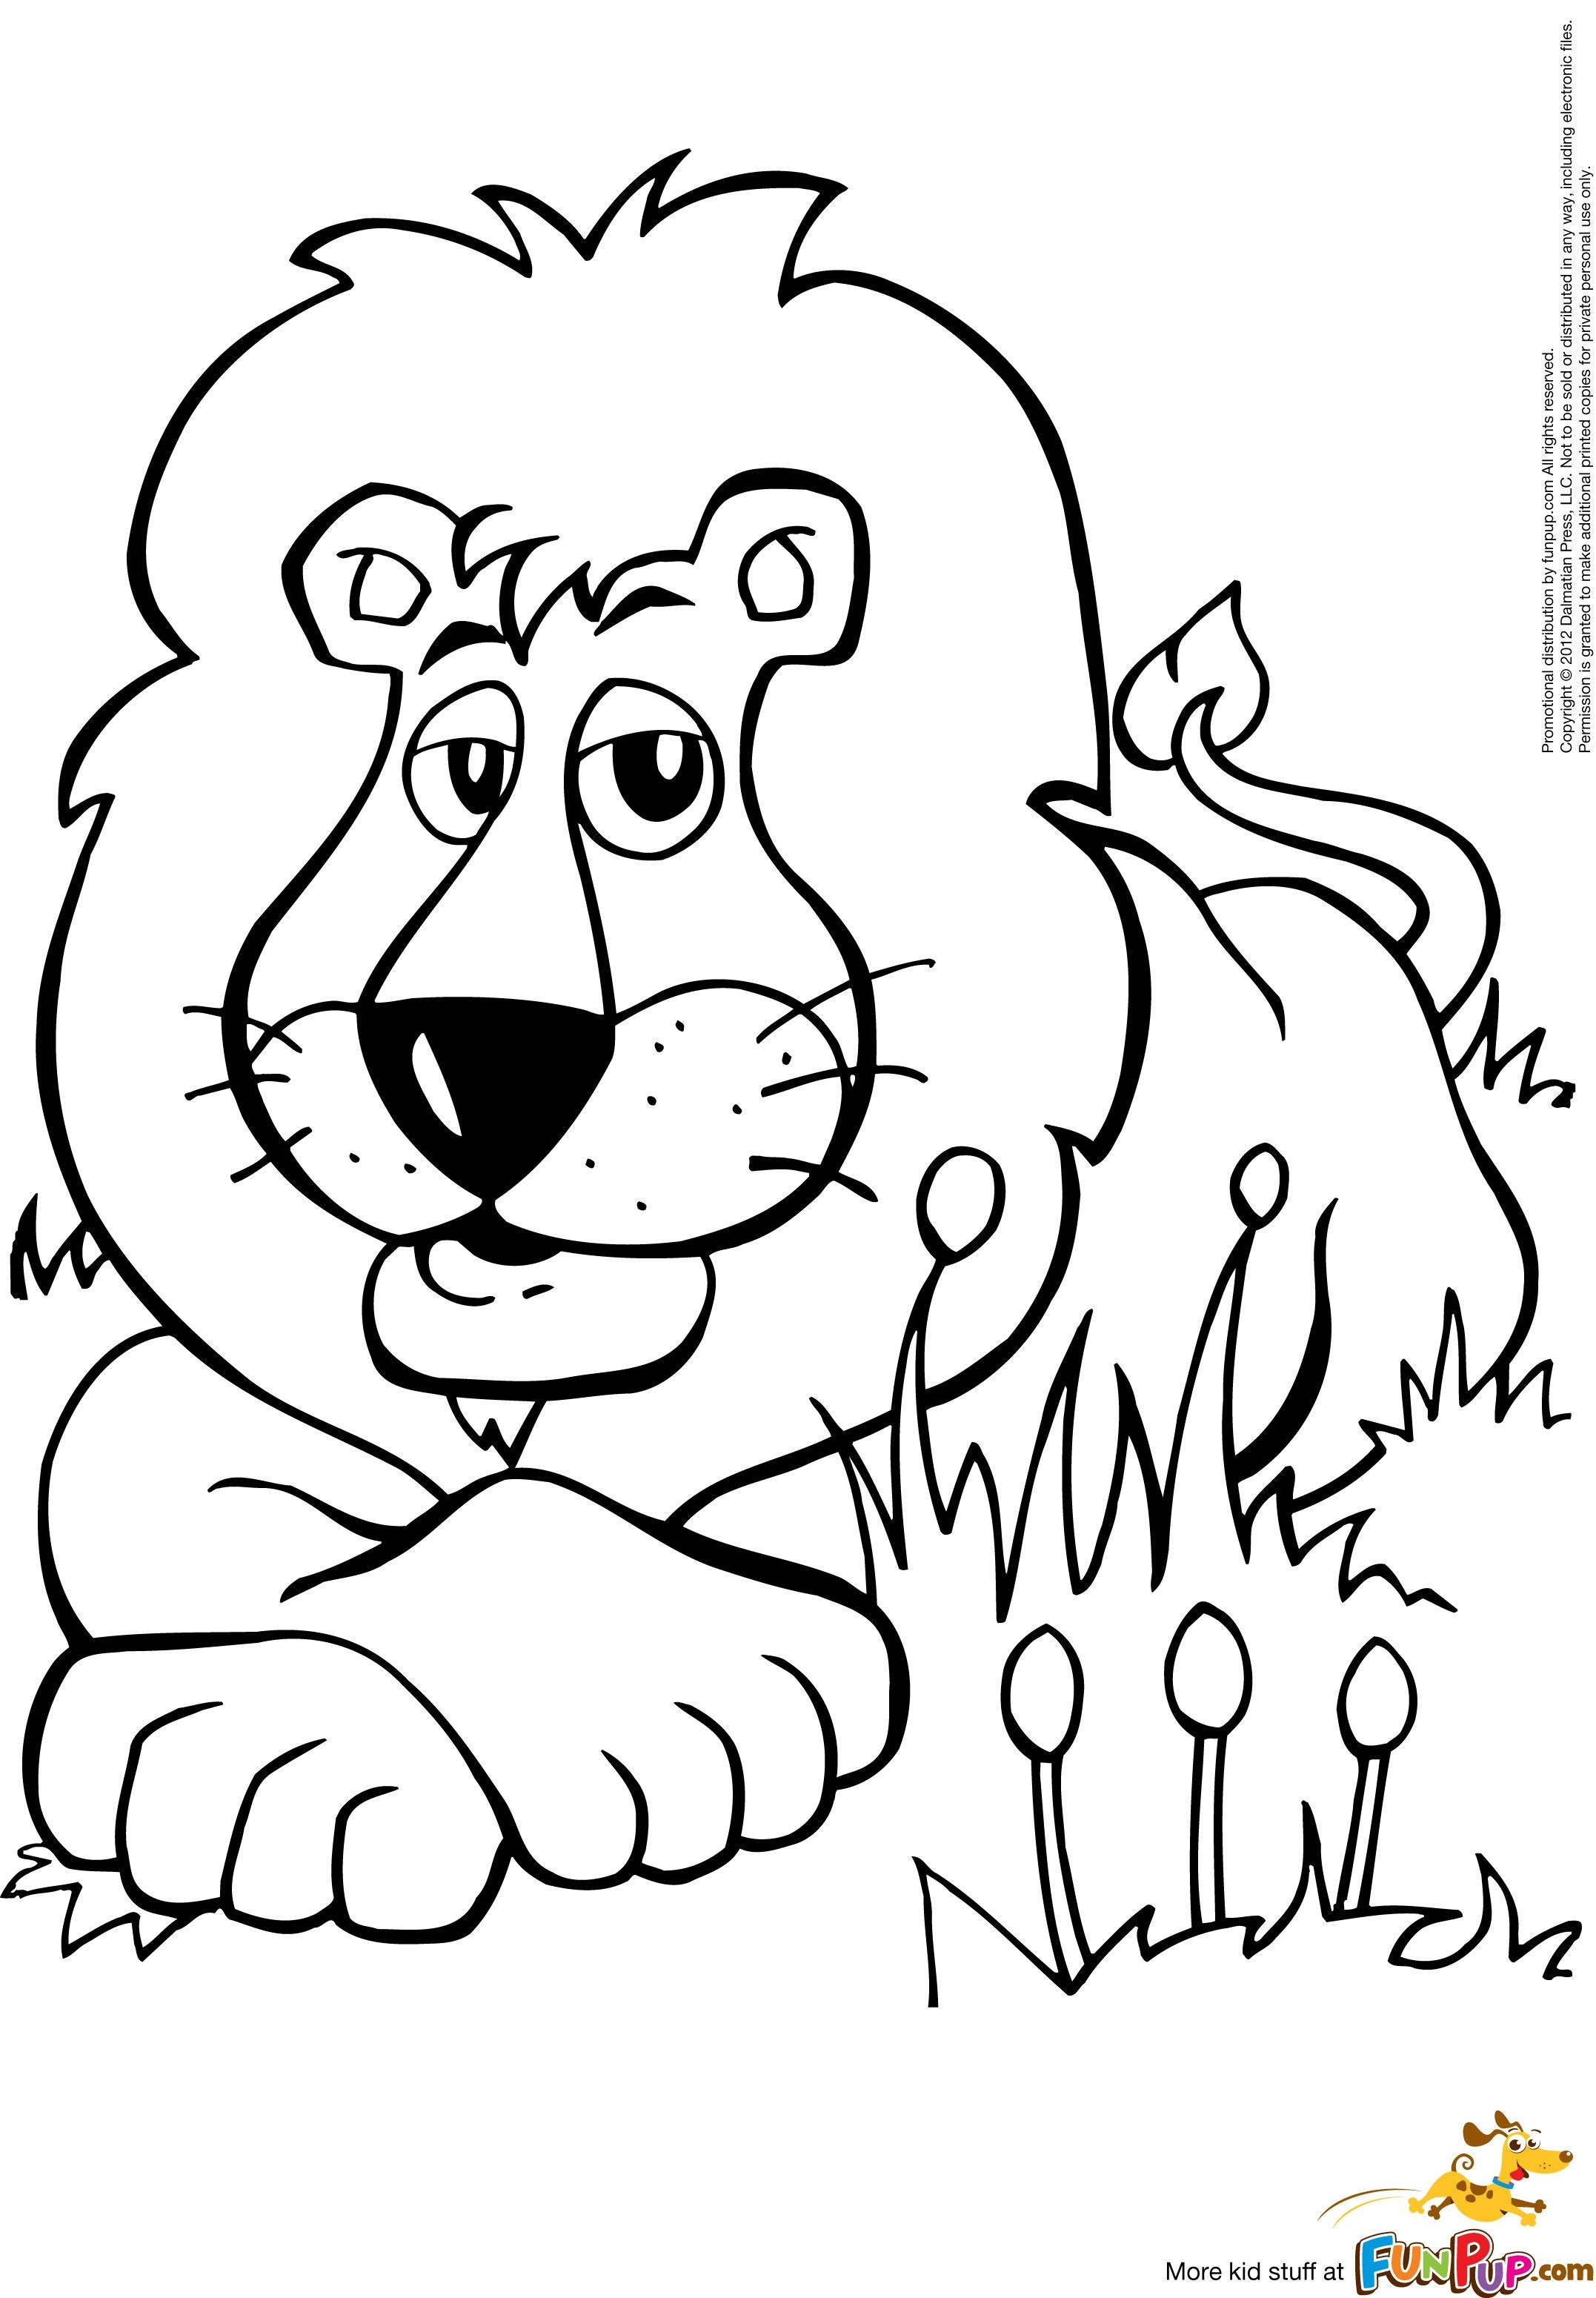 Lion 0 00 Kleurplaten Dieren Leeuw